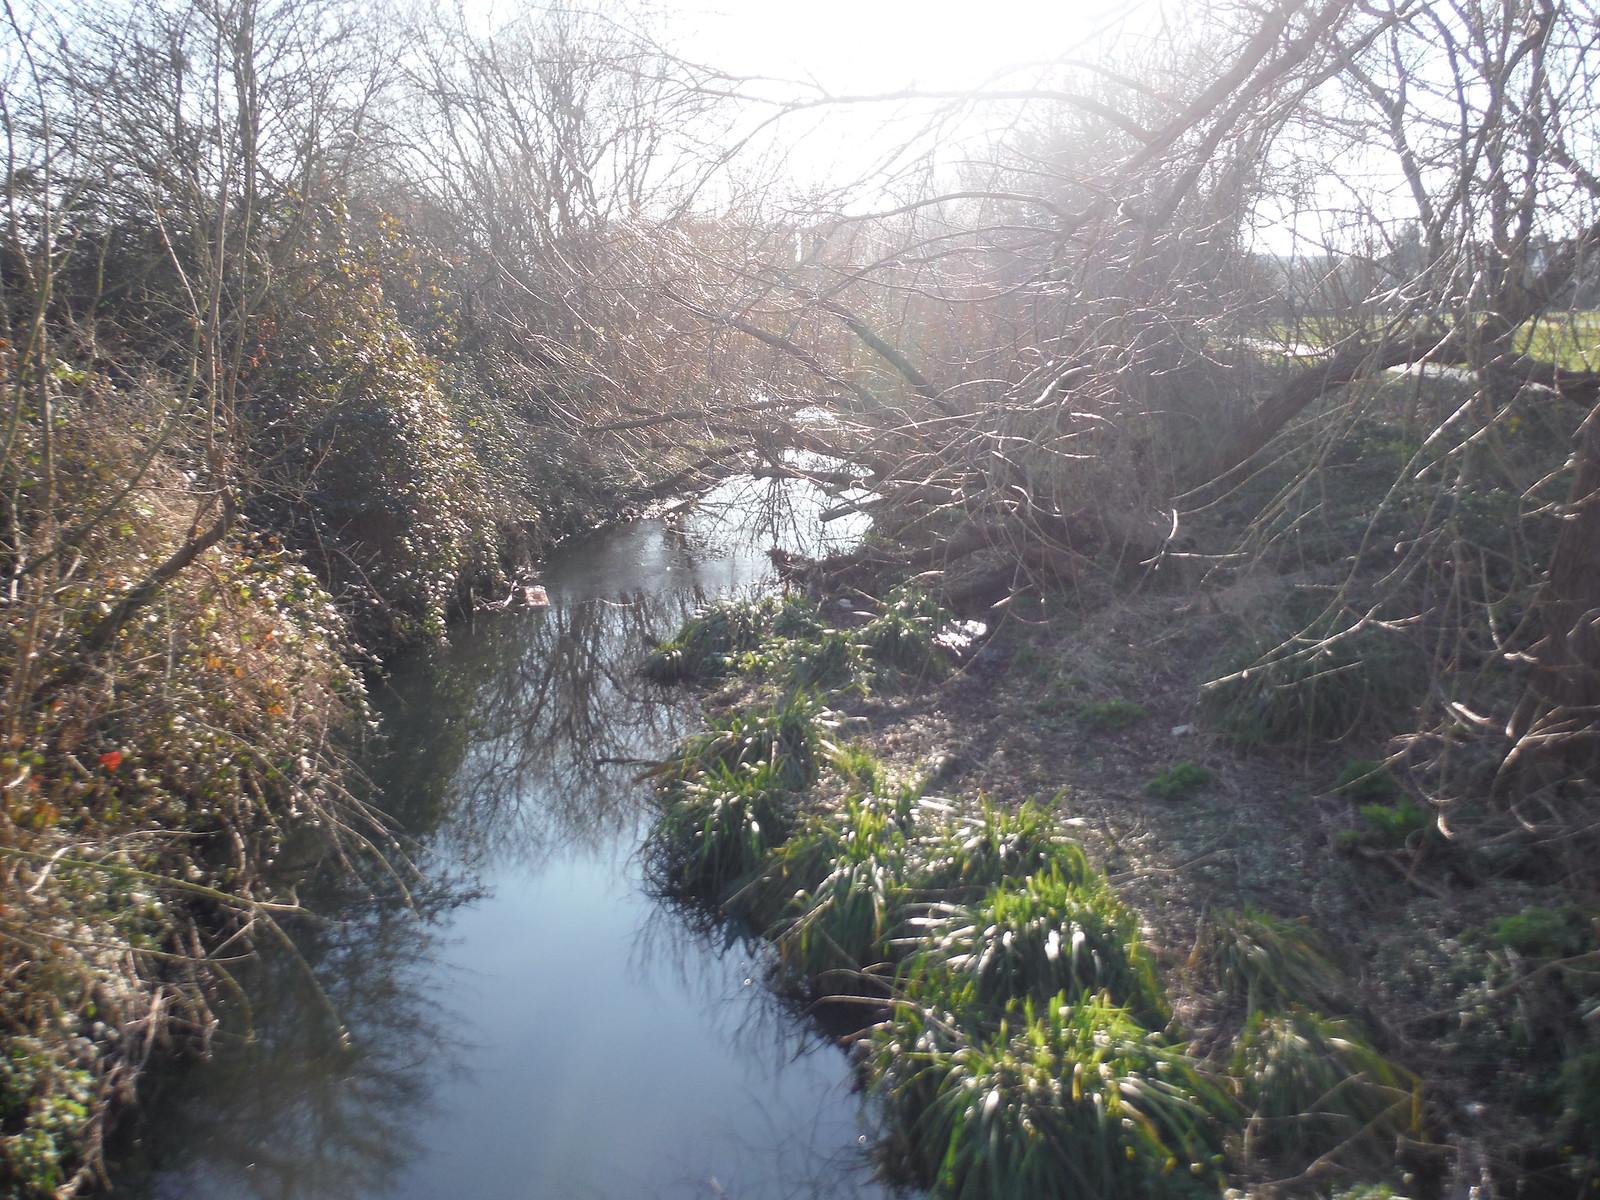 River Pool, The Riverview Walk, Sydenham SWC Short Walk 36 - Waterlink Way (Lower Sydenham to Greenwich)